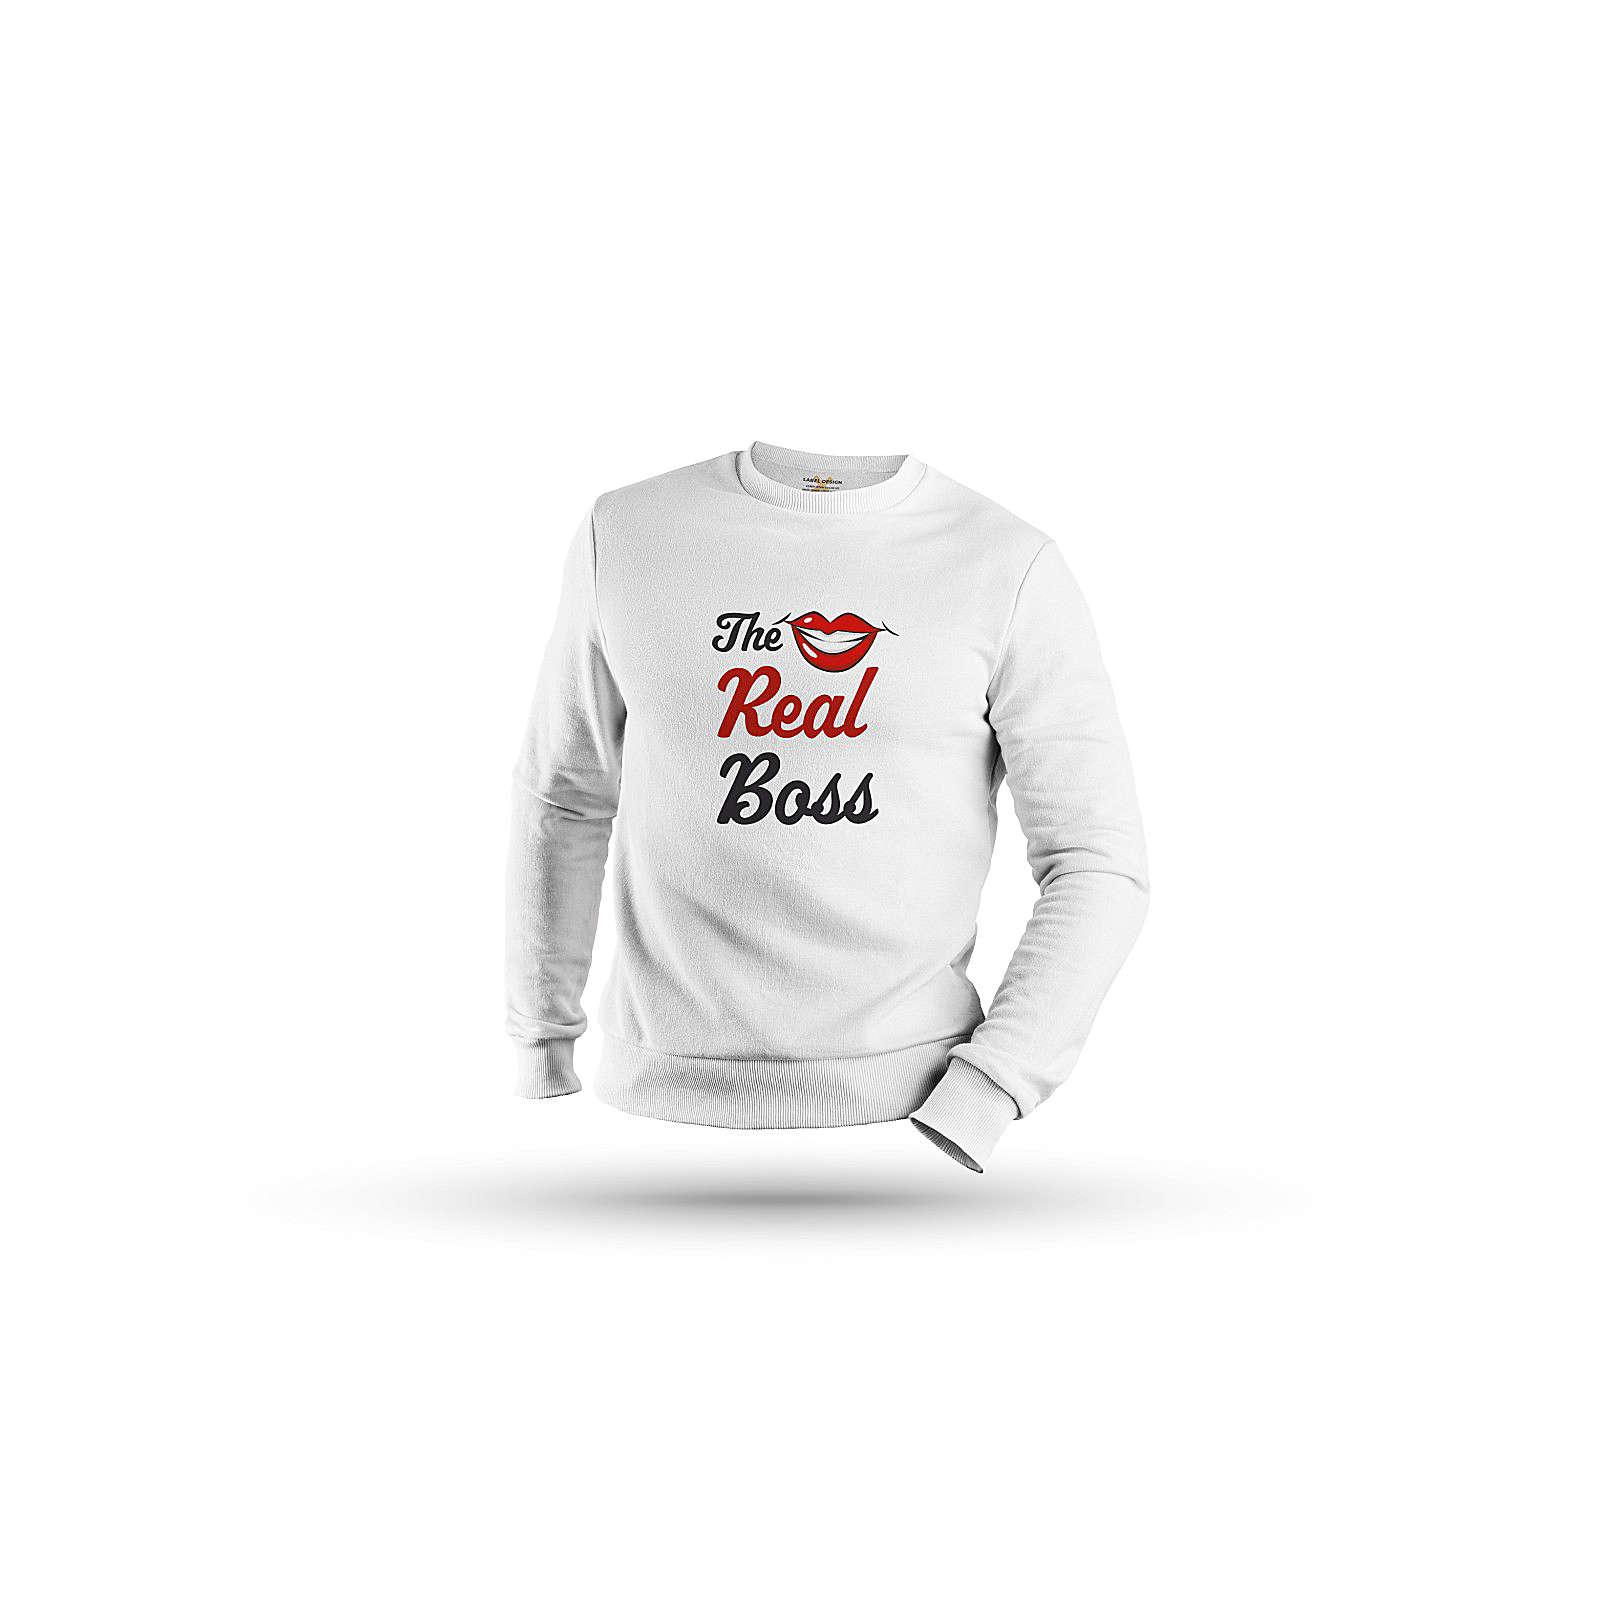 mamino Damen Sweatshirt -the boss & the real boss couple Sweatshirts weiß Damen Gr. 36